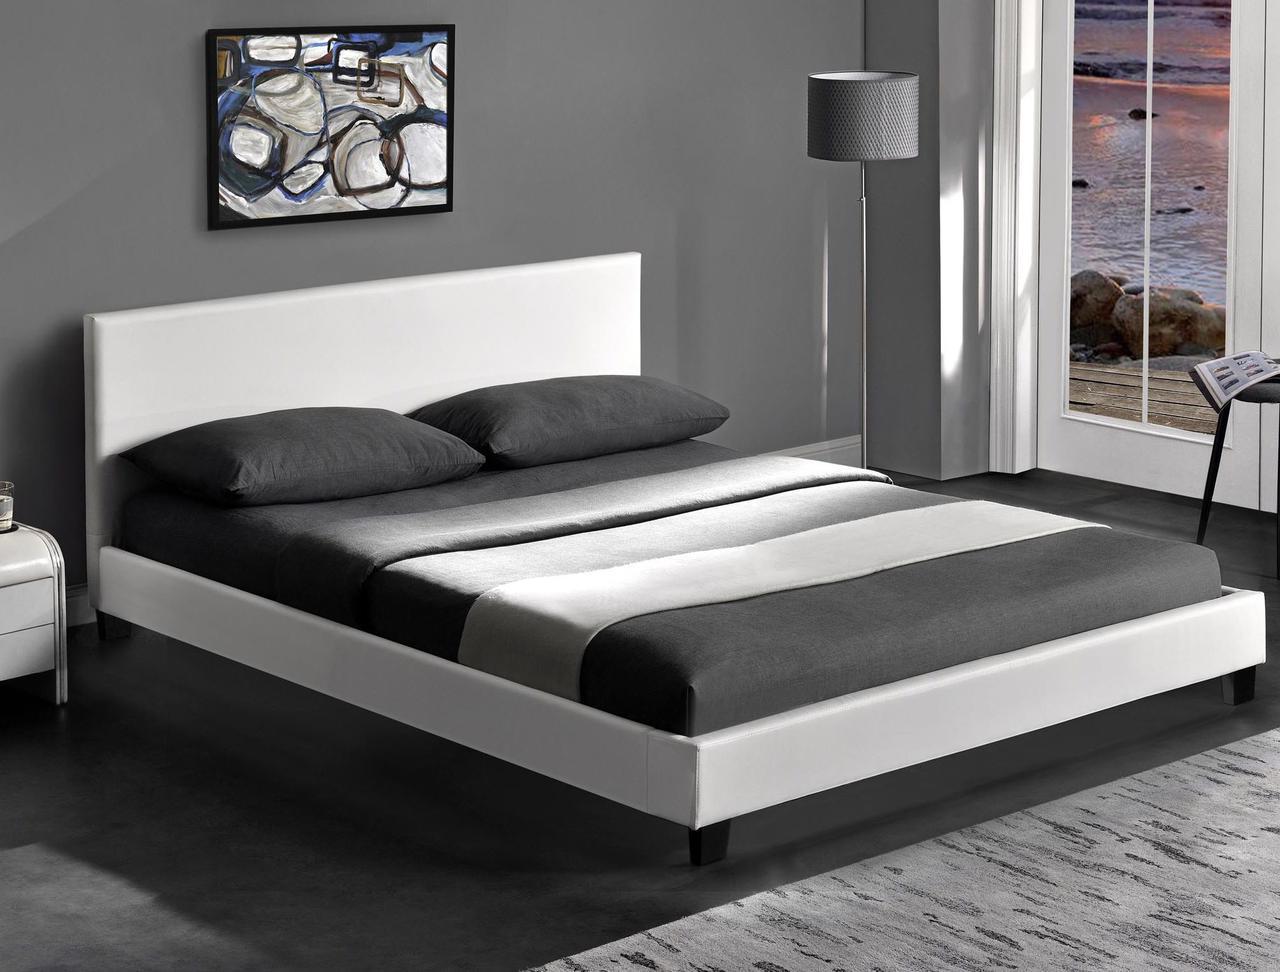 Ліжко двоспальне в спальню Польша Pago 160*200 Halmar